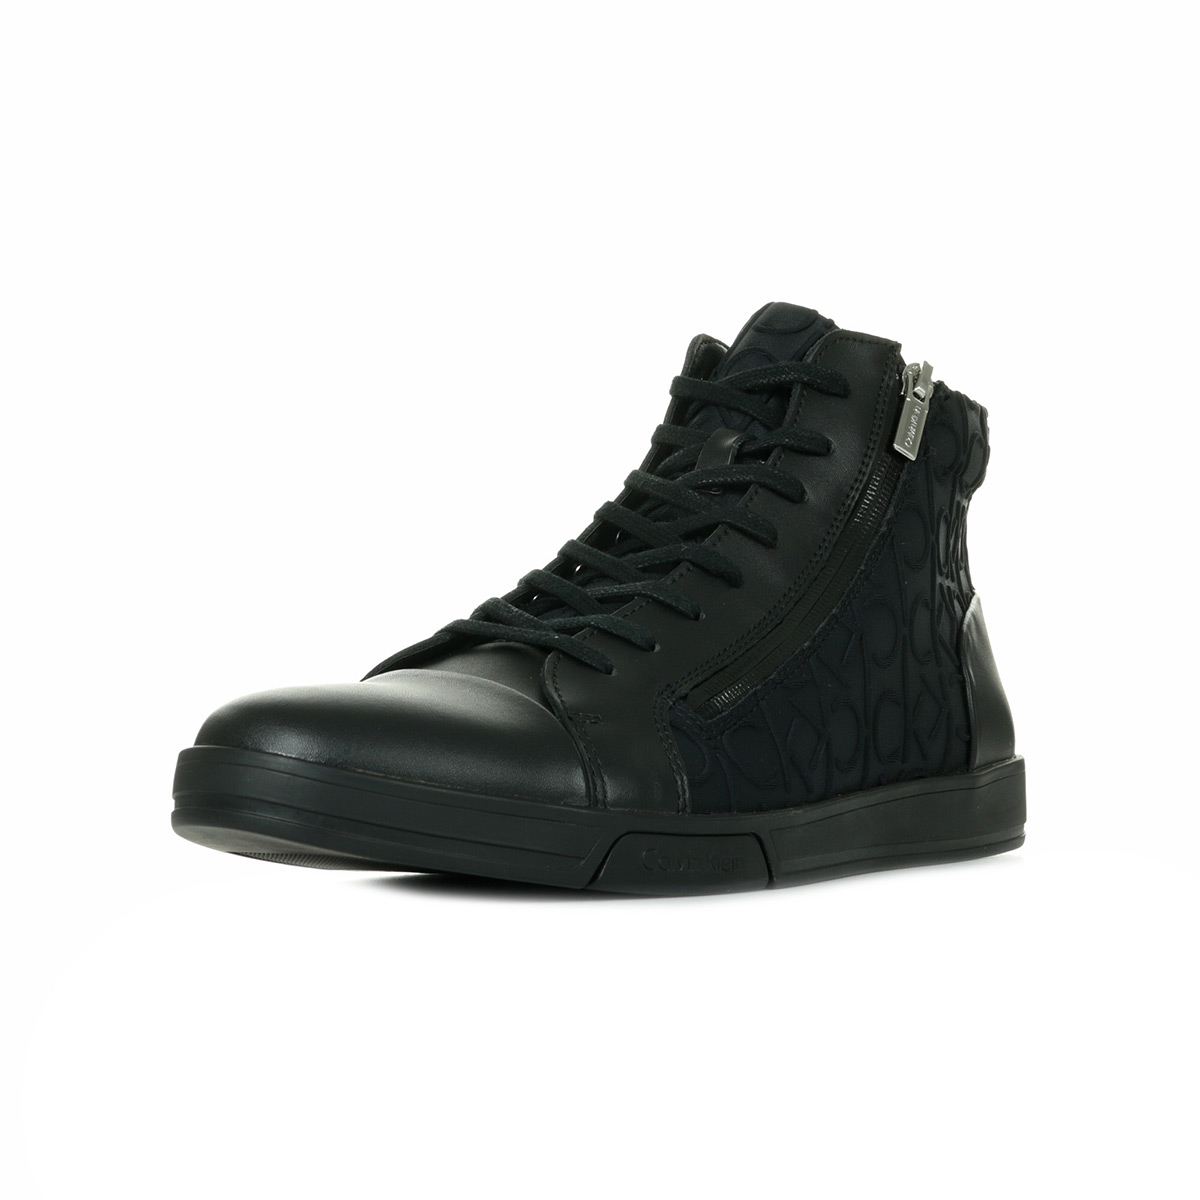 Sur Neop Baskets Chaussures Détails Berke Noir Leath Ck Klein Taille Calvin Embos Homme Brsh gdqppwTU